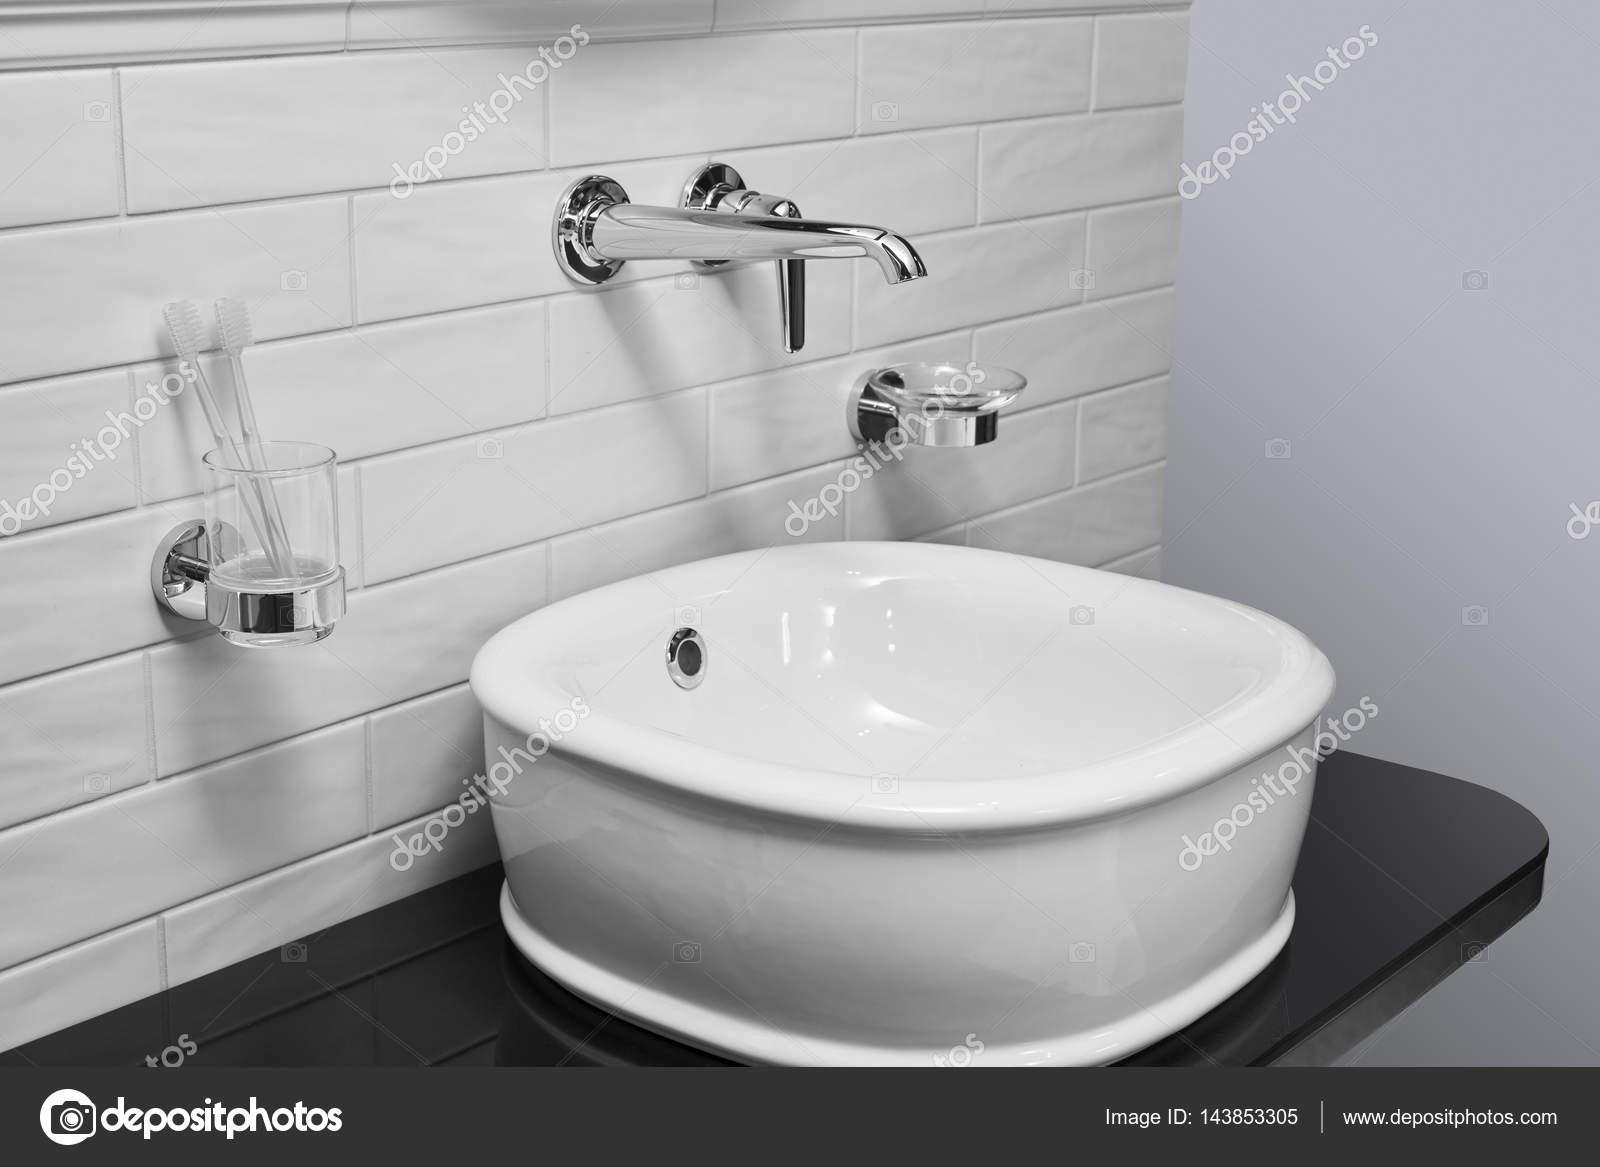 Badezimmer fliesen entkalken